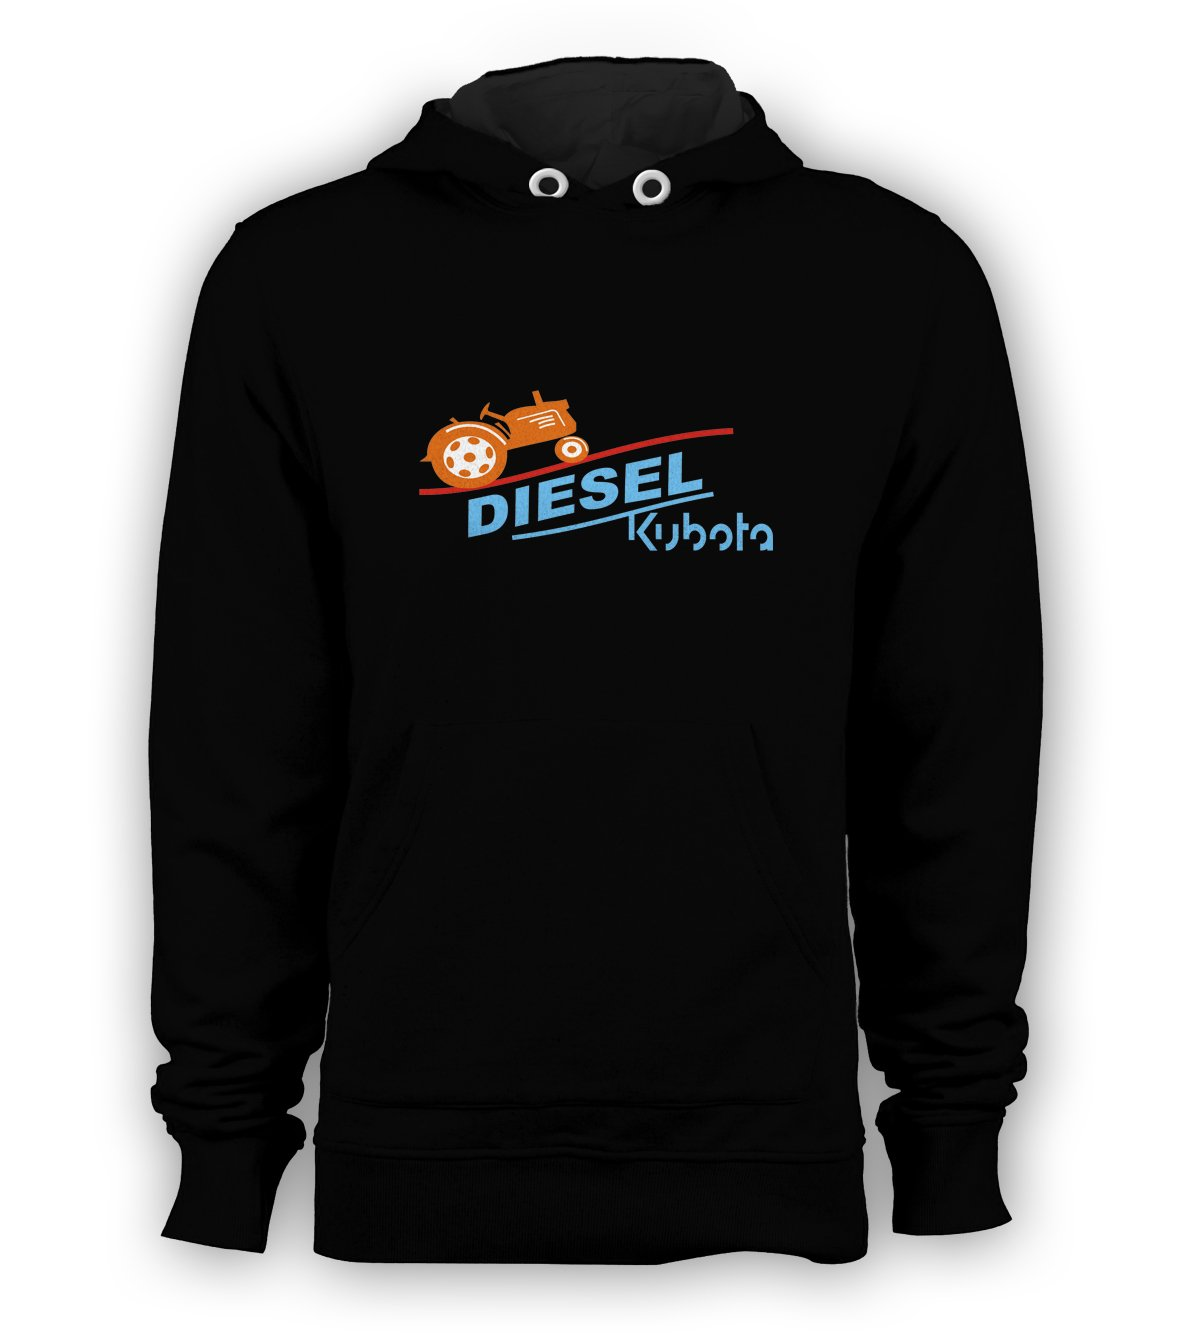 Kubota Diesel Pullover Hoodie Men Sweatshirts Size S to 3XL New Black